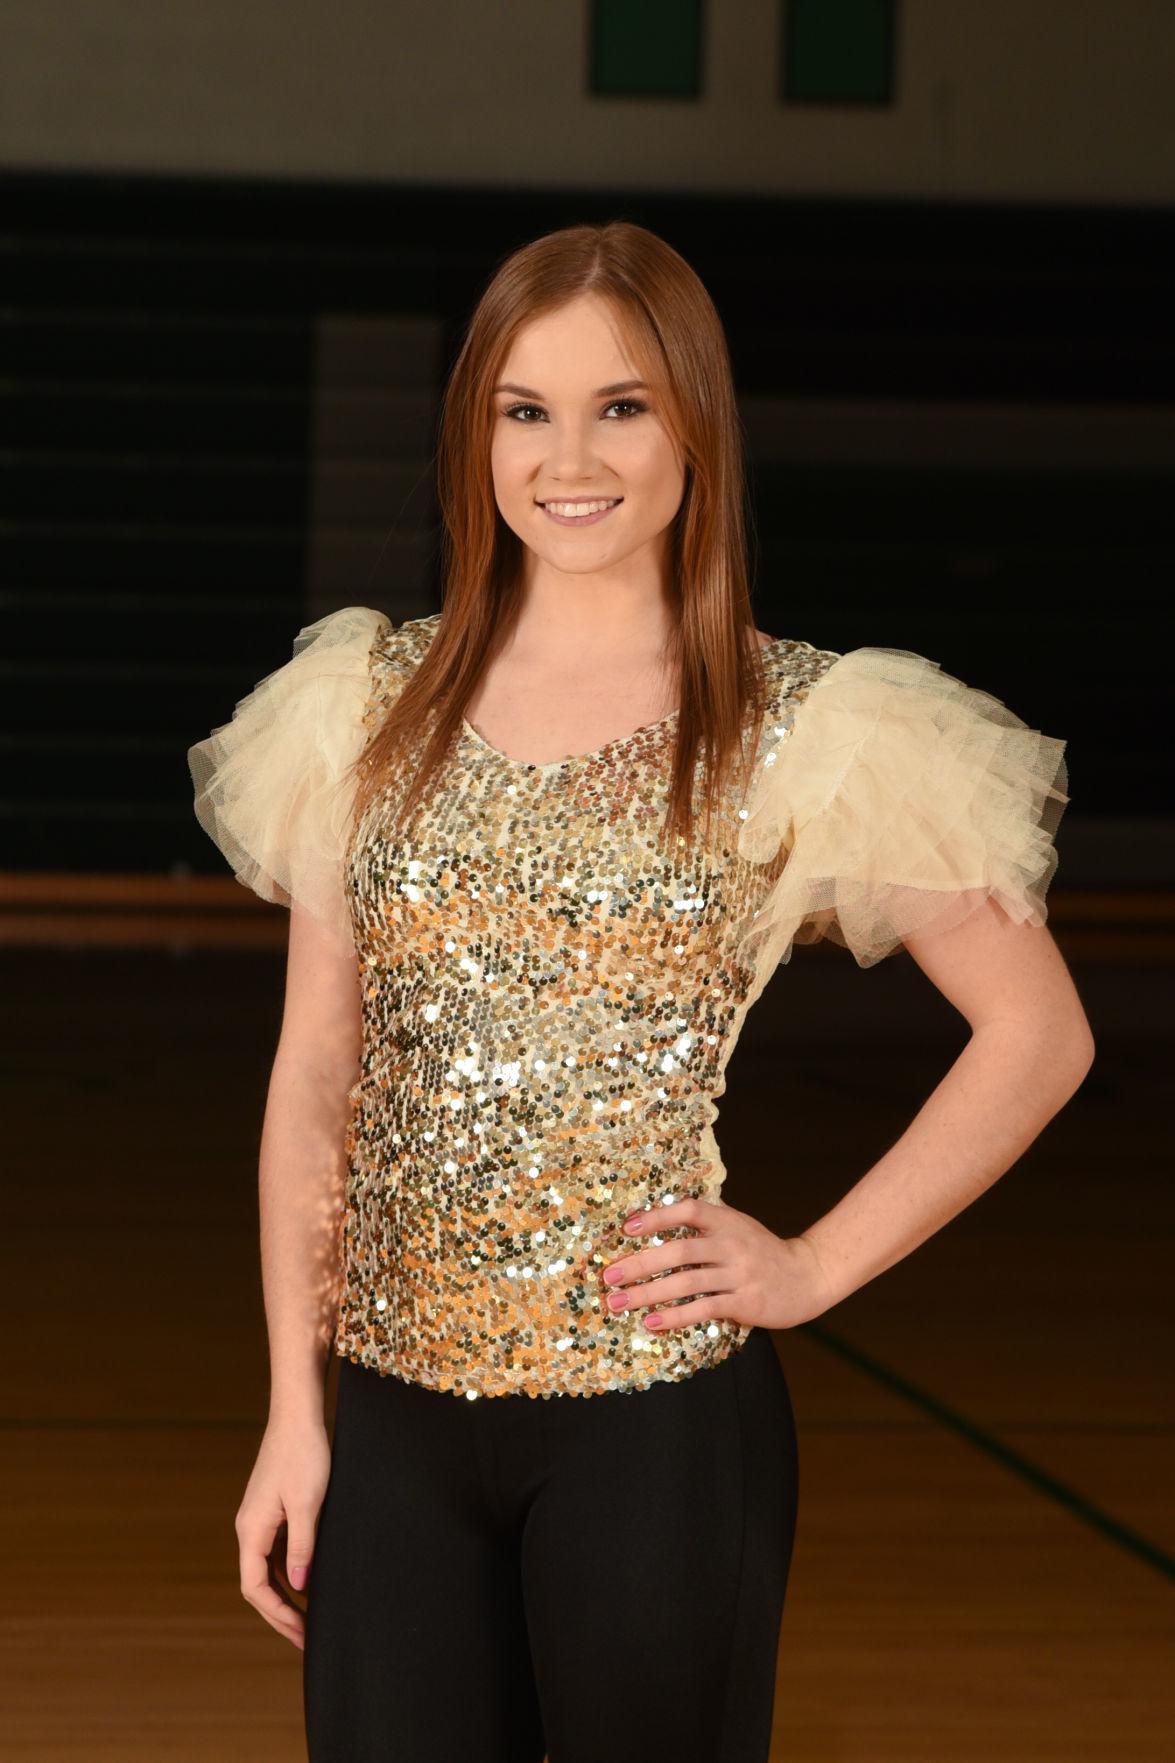 Katelyn Halbach